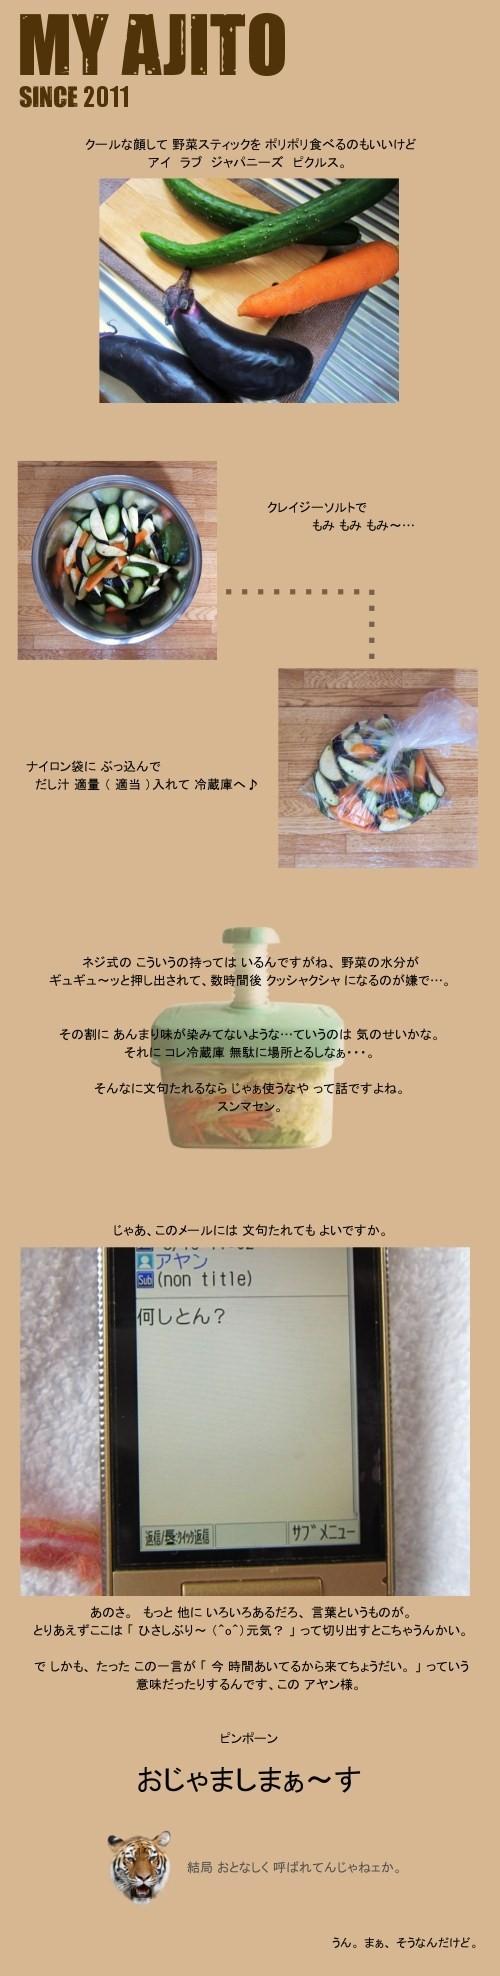 tsuke_02.jpg